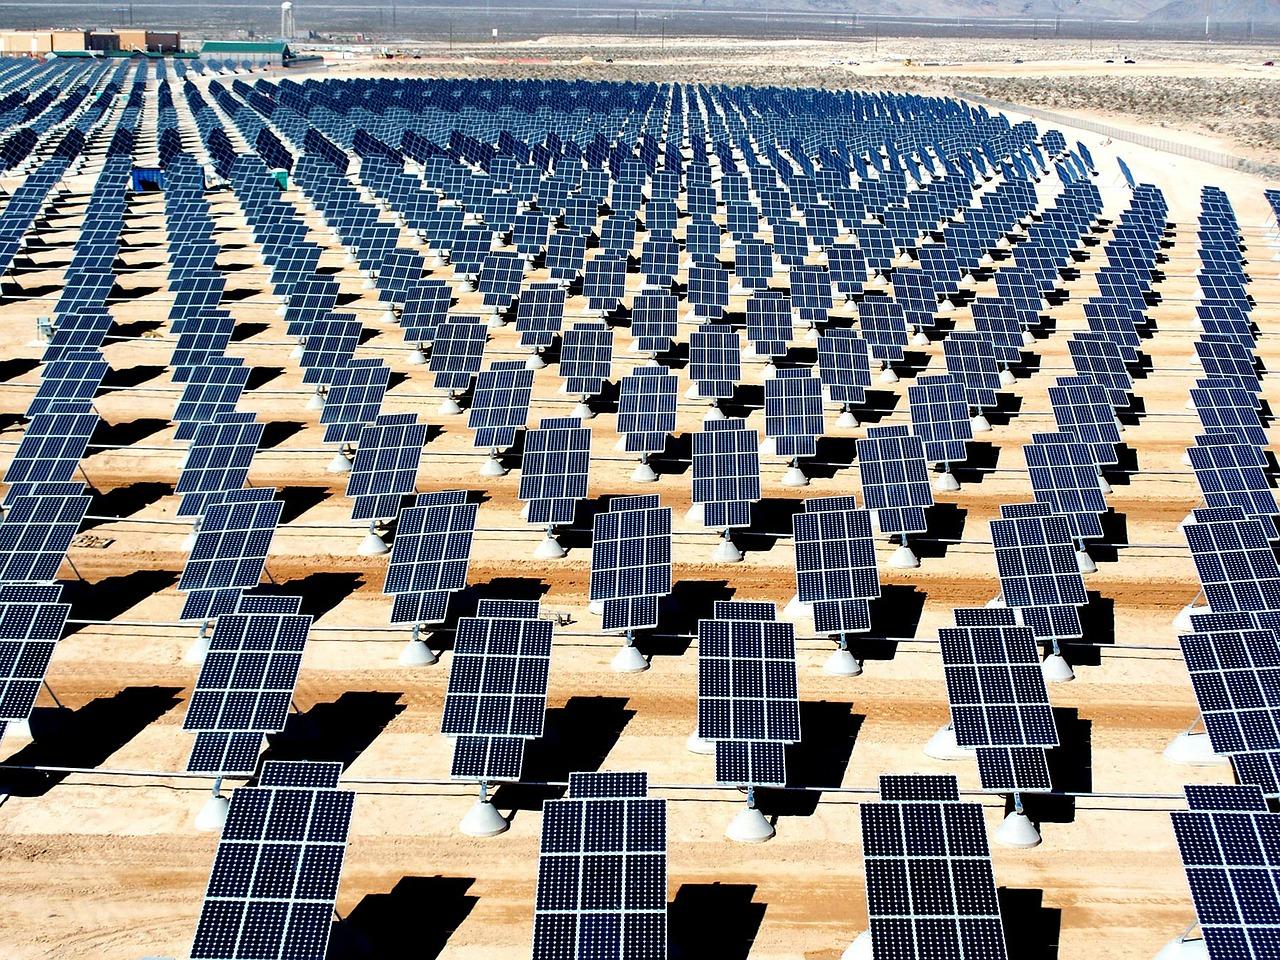 Spotlight – Saudi Arabia to Develop Renewable Energy Projects